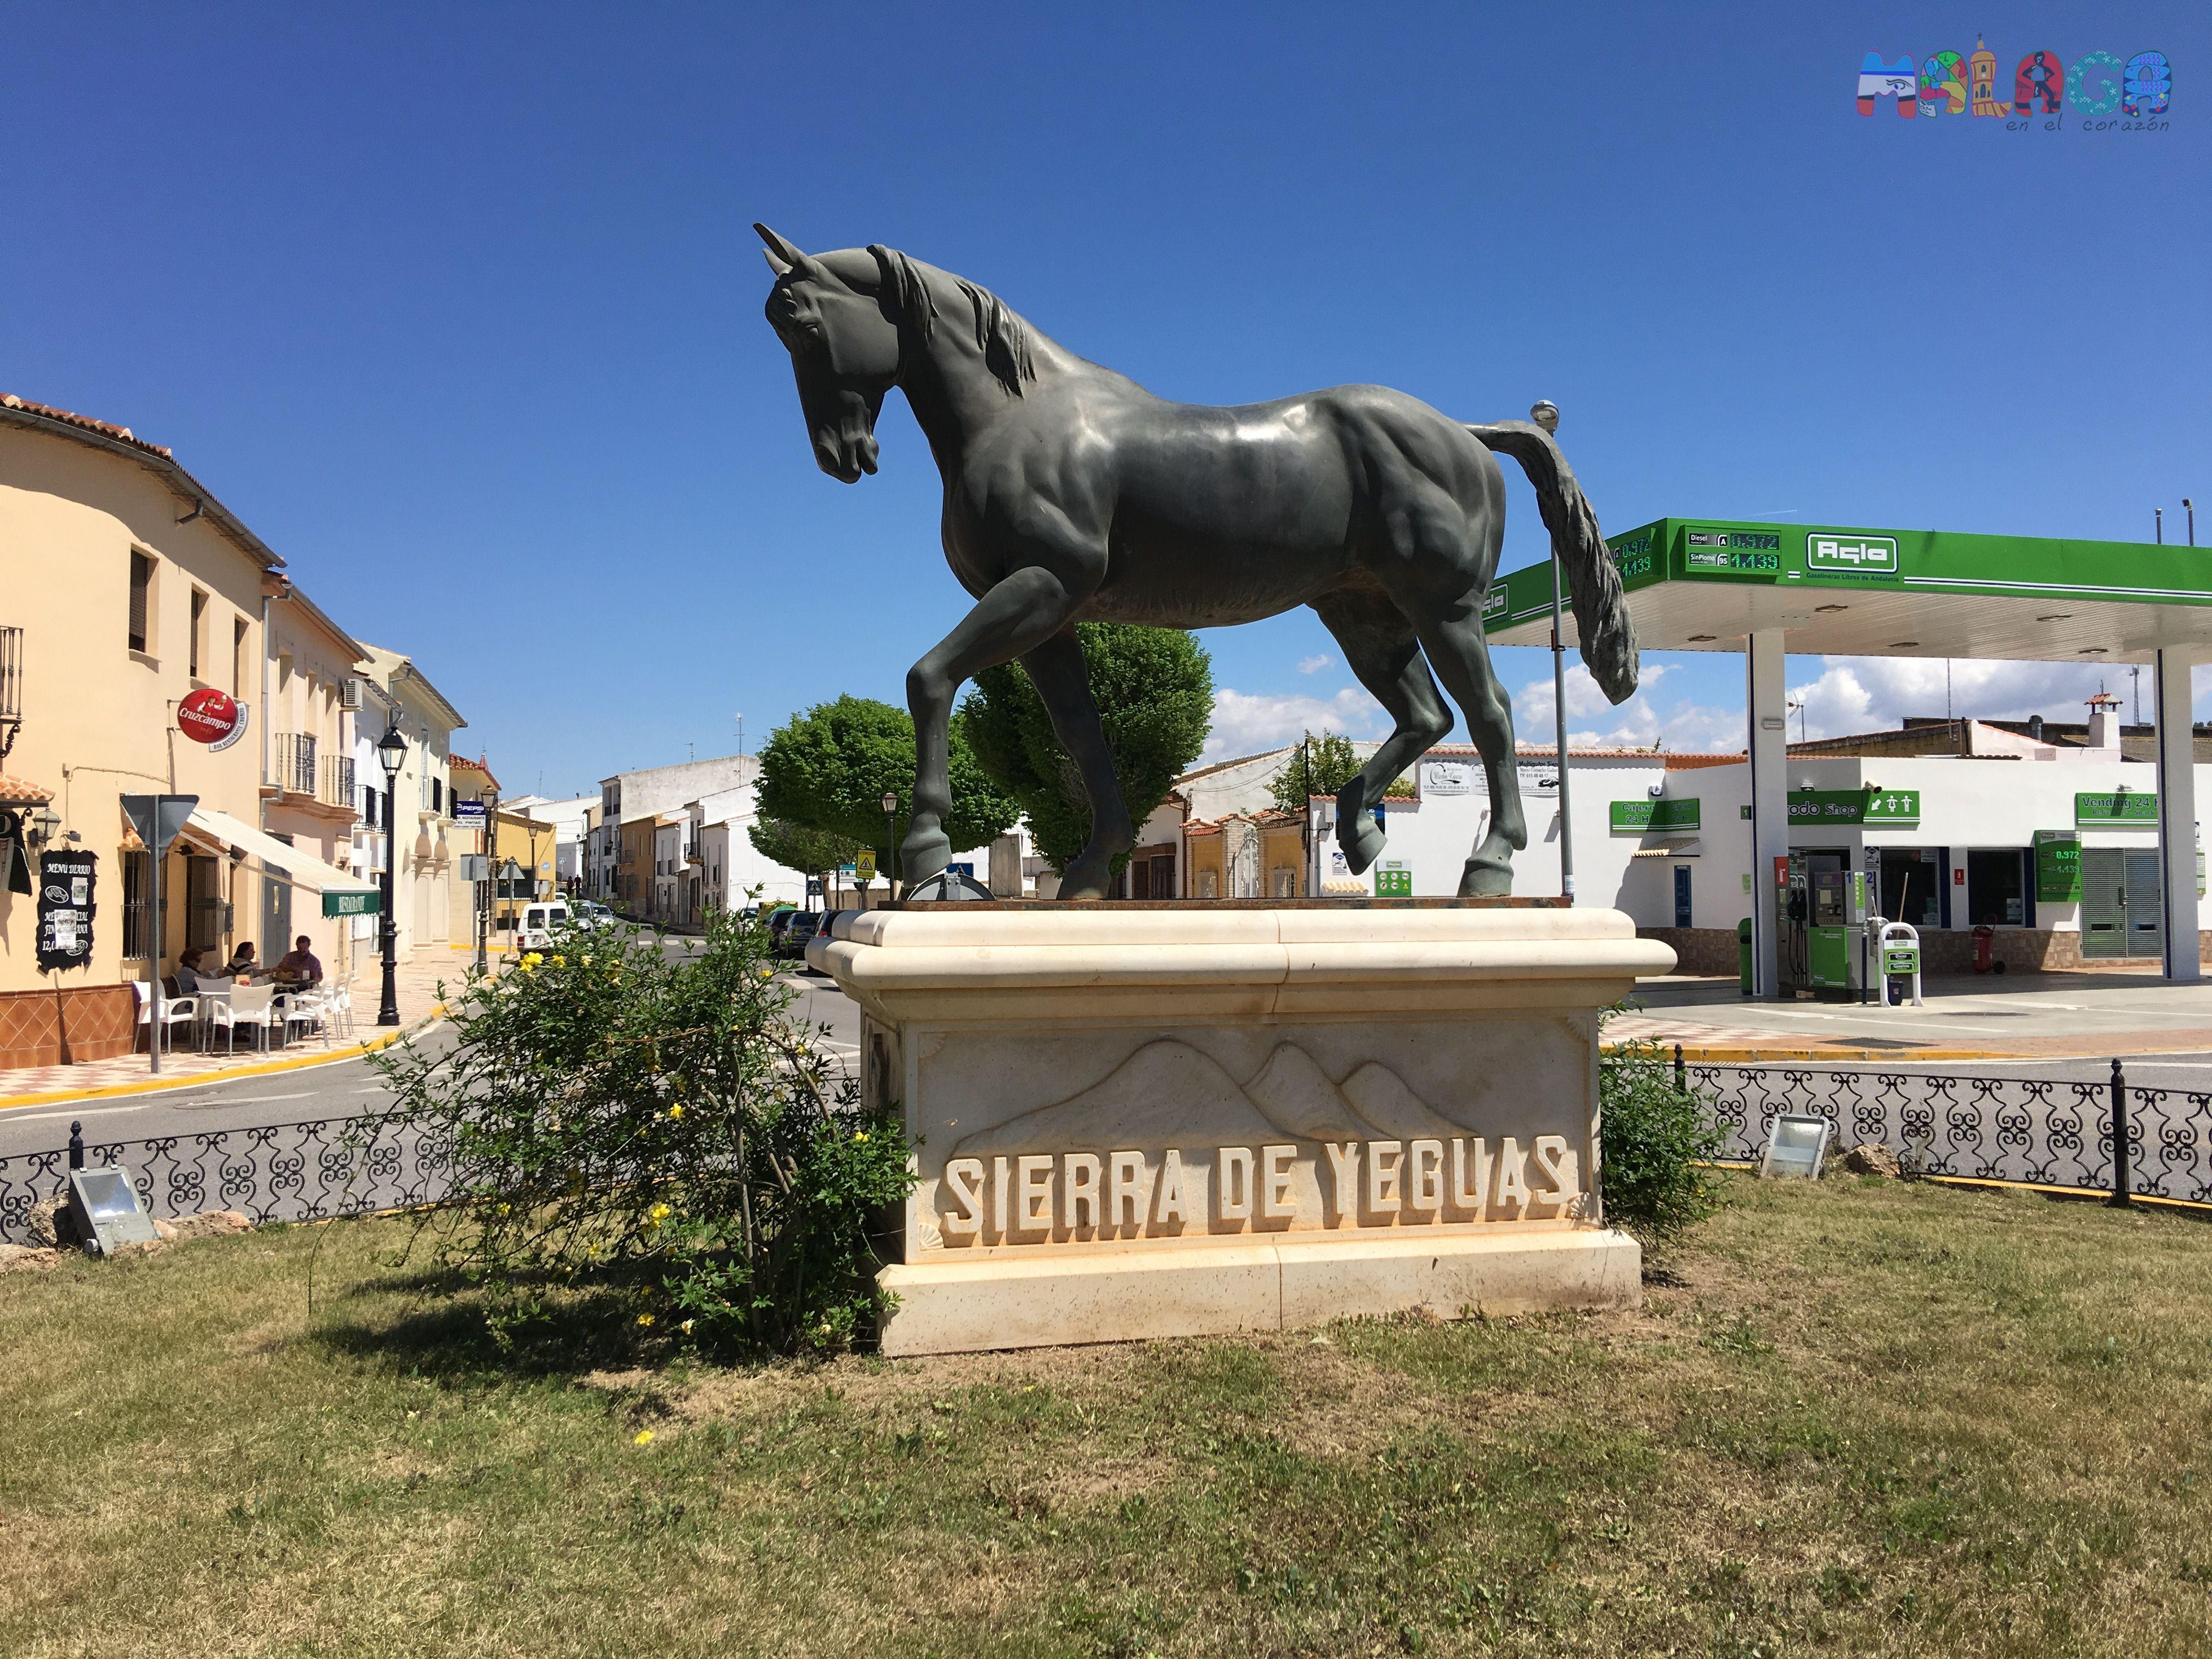 Sierra_de_yeguas_11